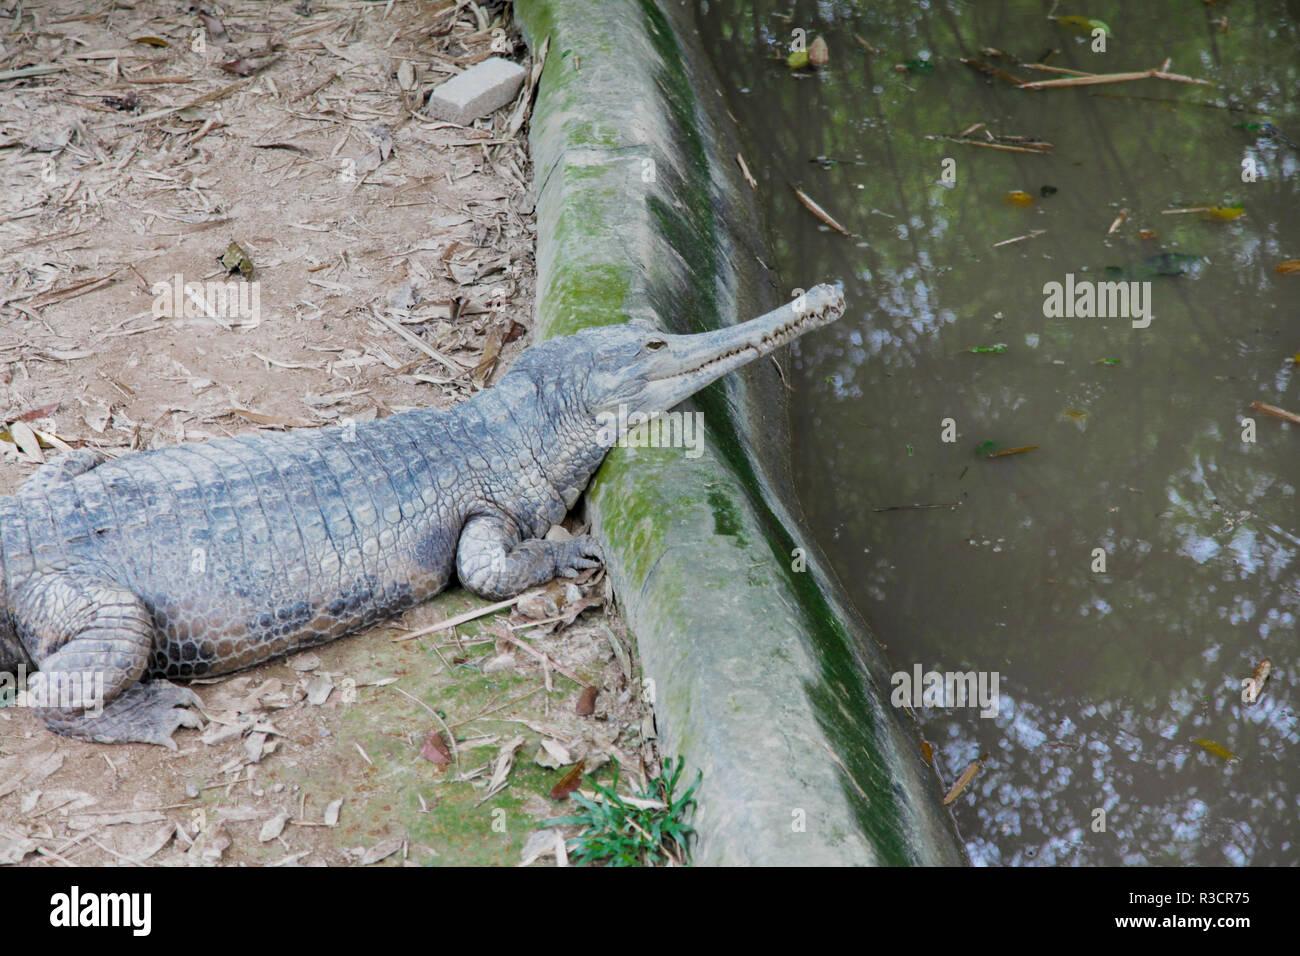 Malayan Gharial crocodile - Stock Image